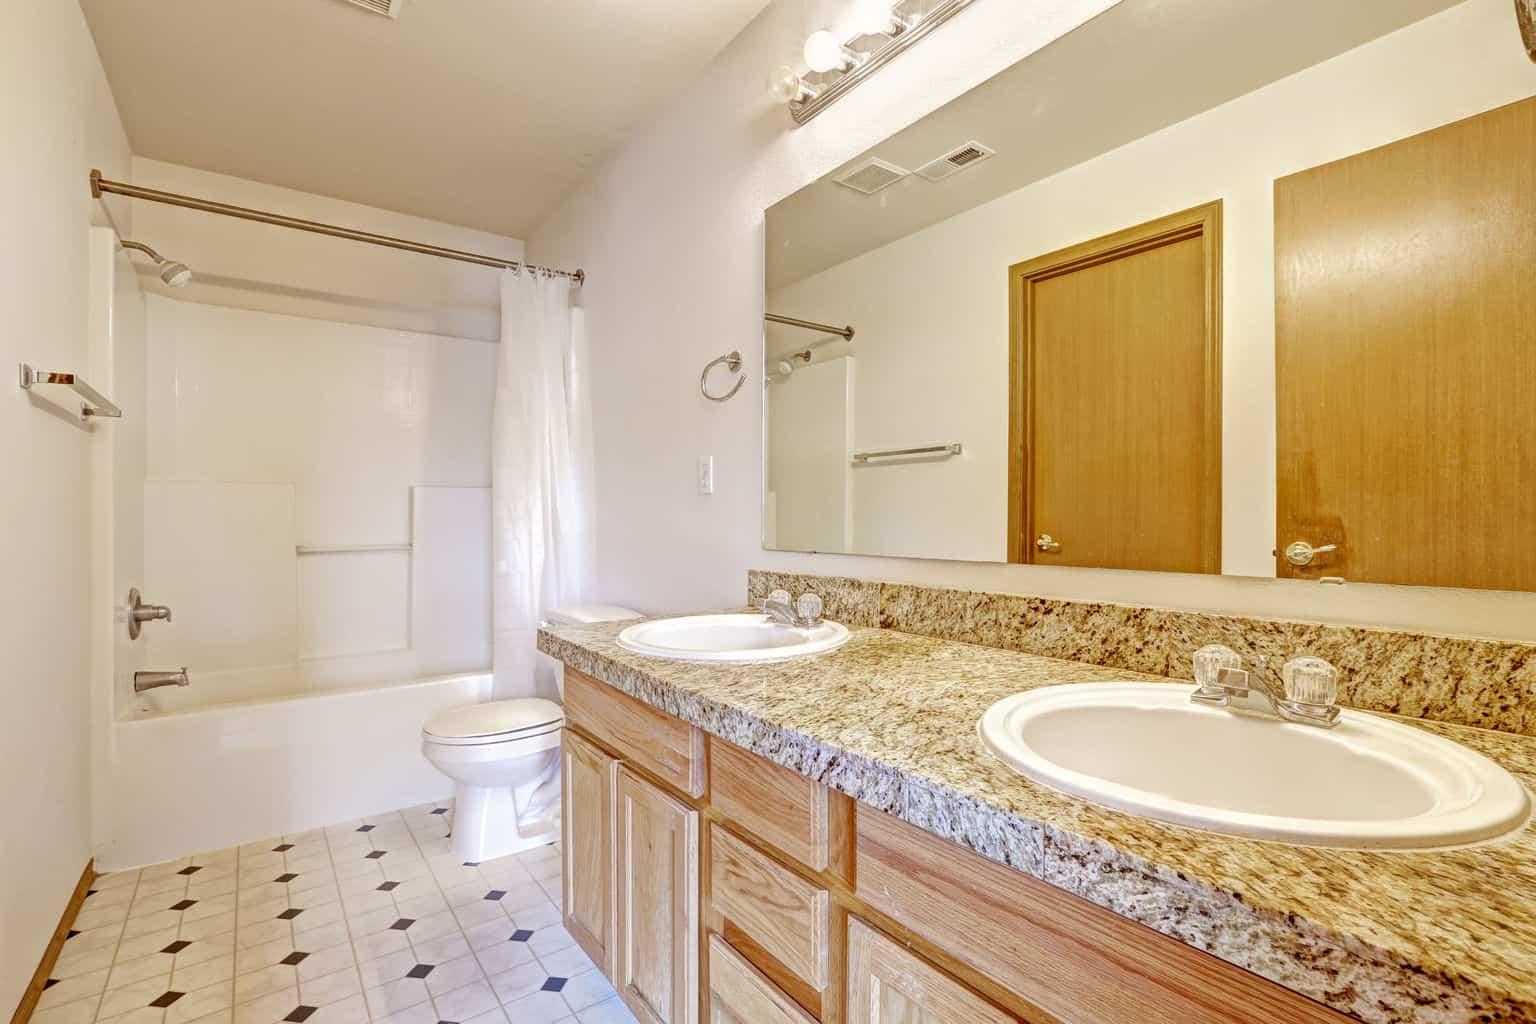 10 Cheap Flooring Ideas | Best Home Flooring Ideas and Options